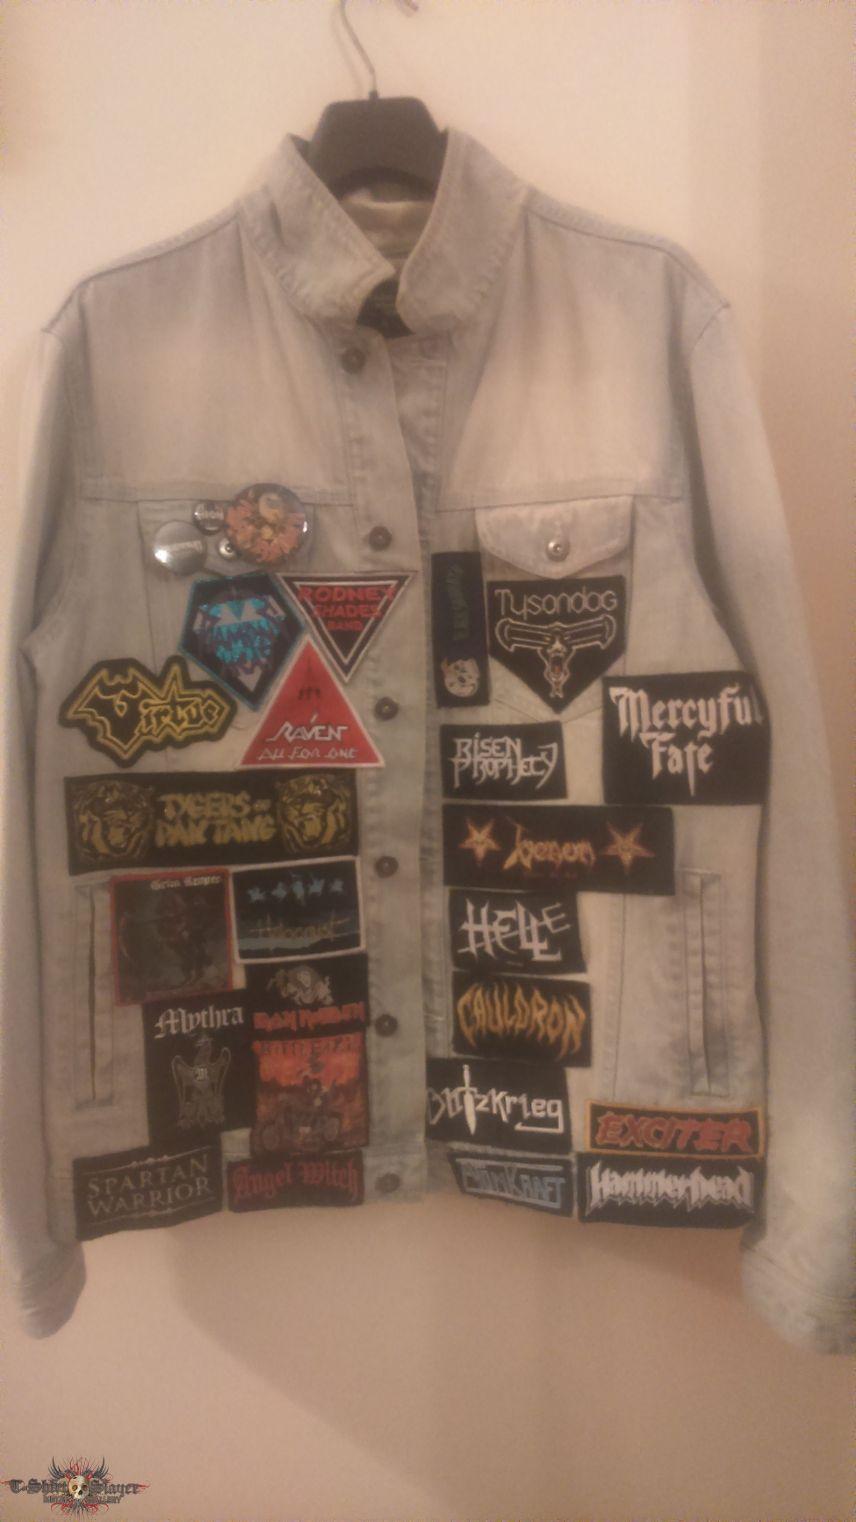 NWOBHM jacket in progress